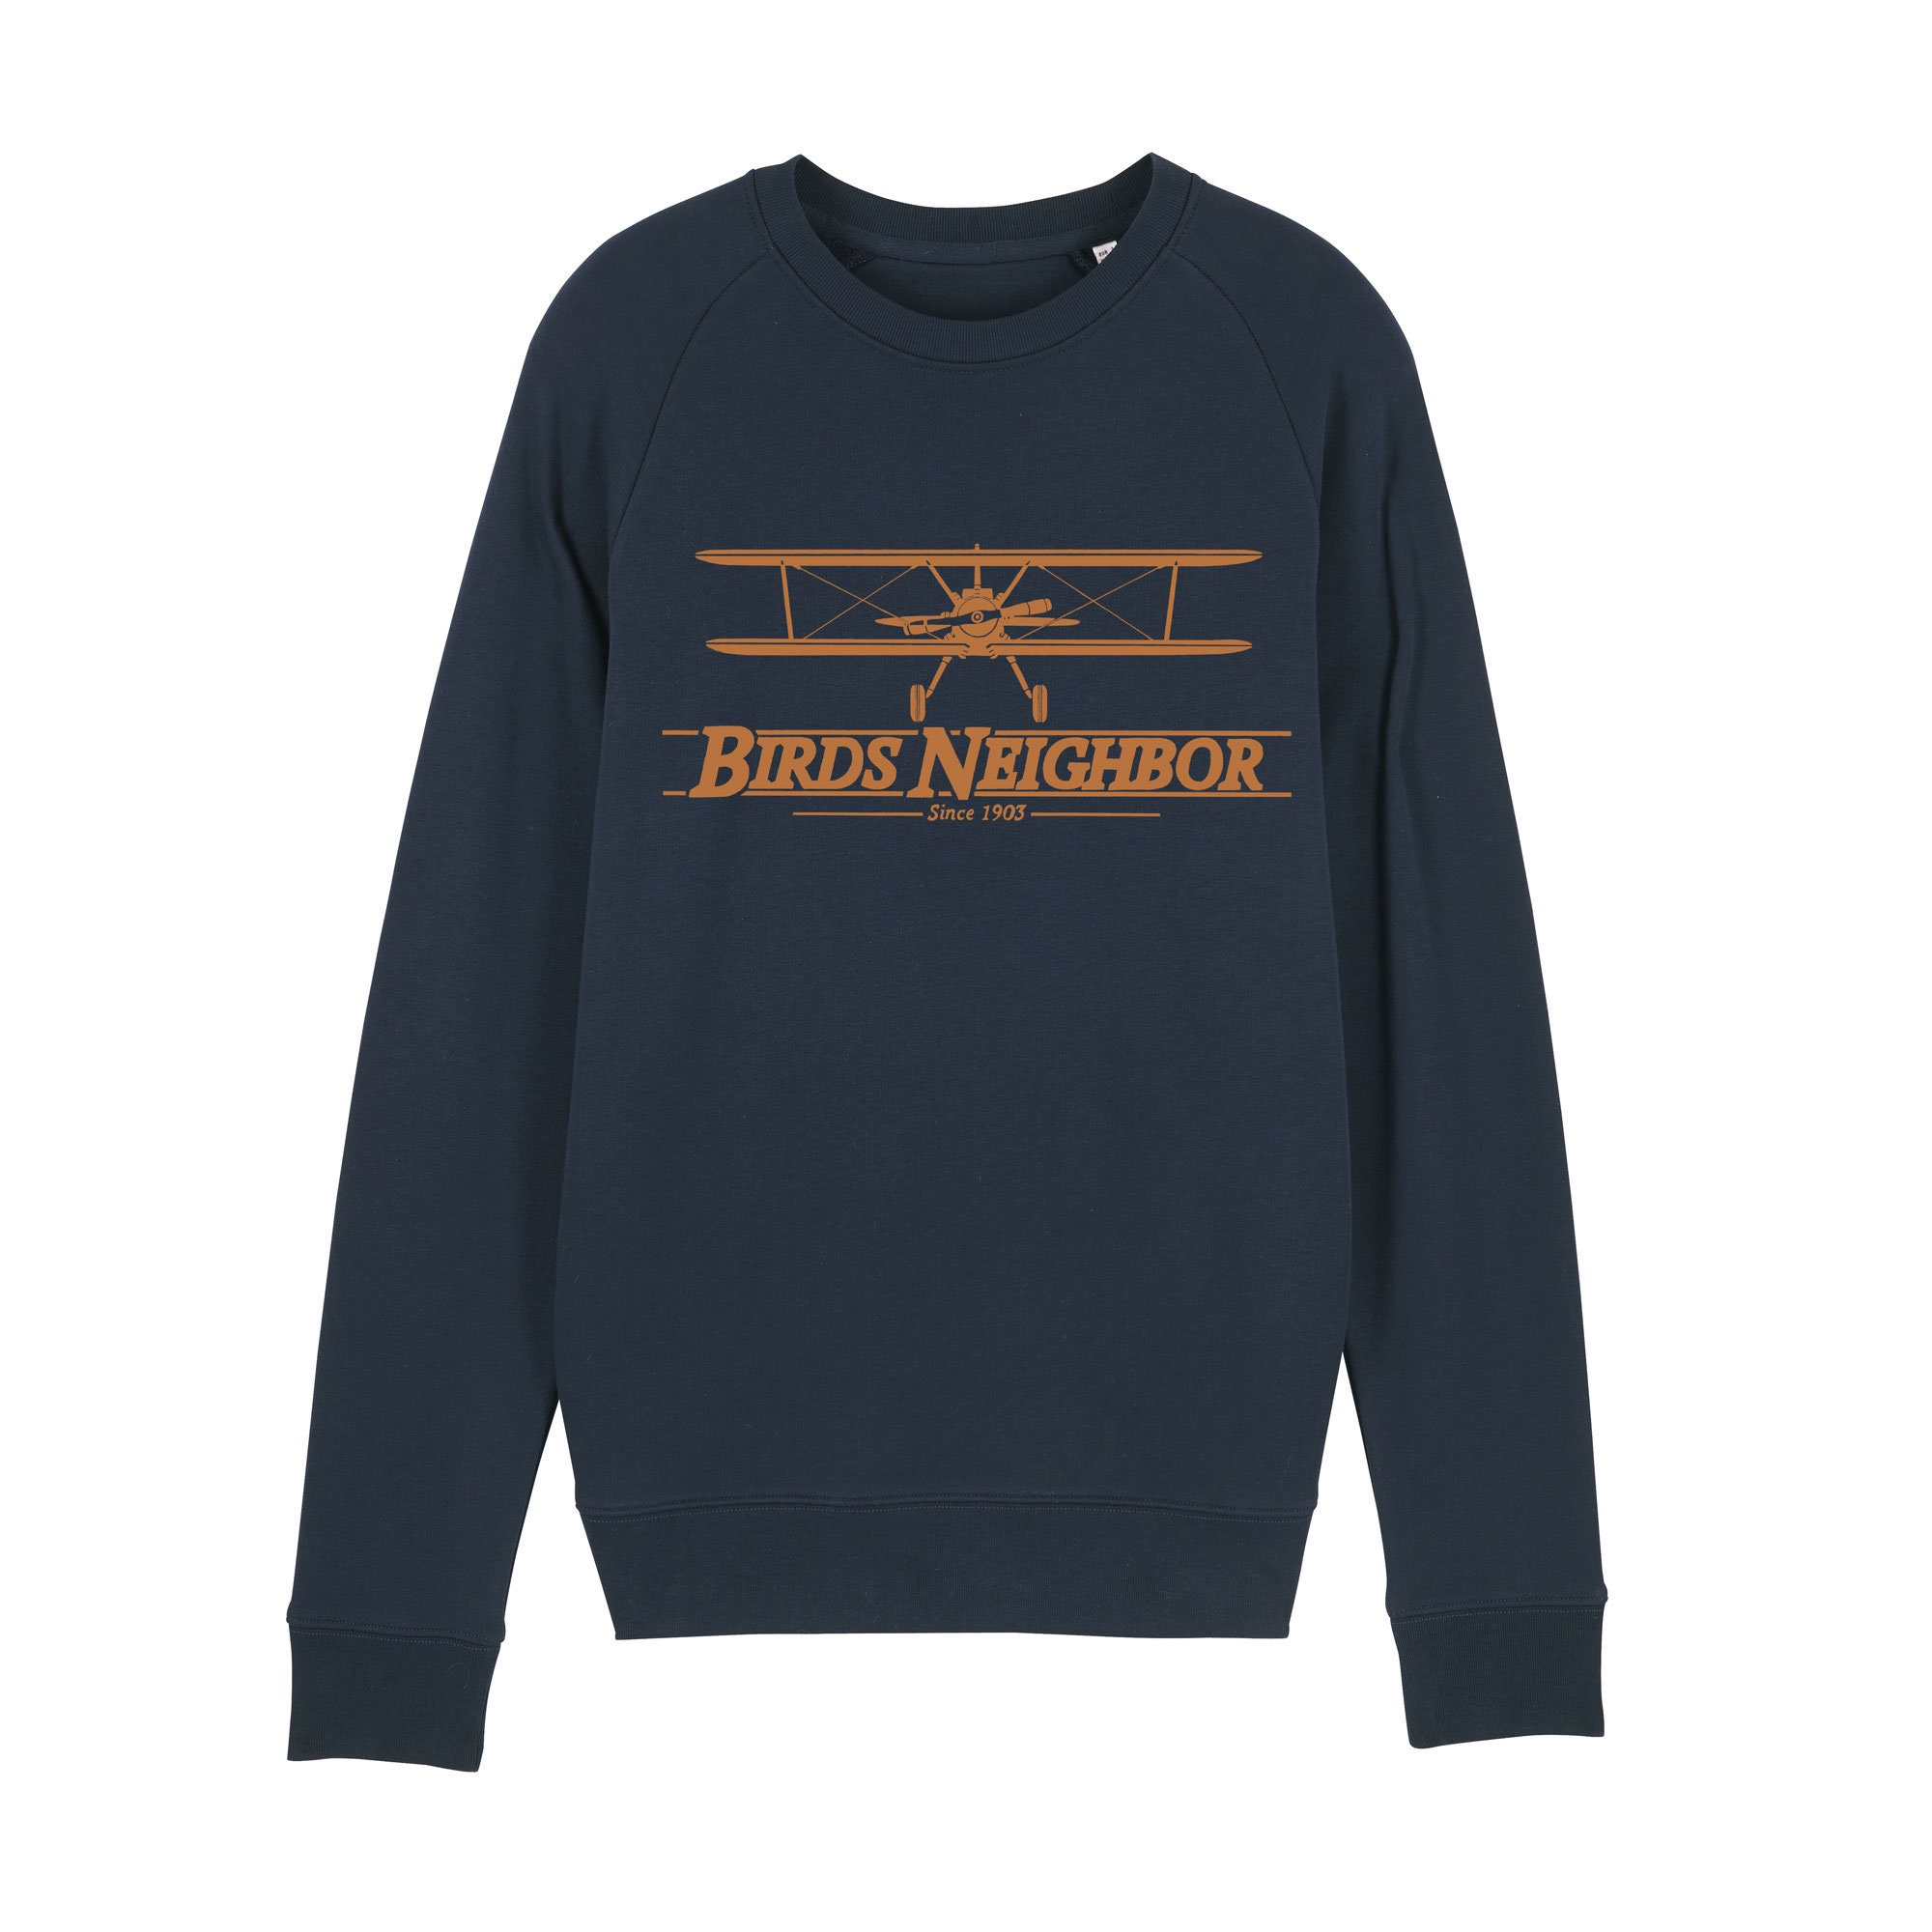 Airplane Oldschool Sweatshirt / organic / organic ink / made